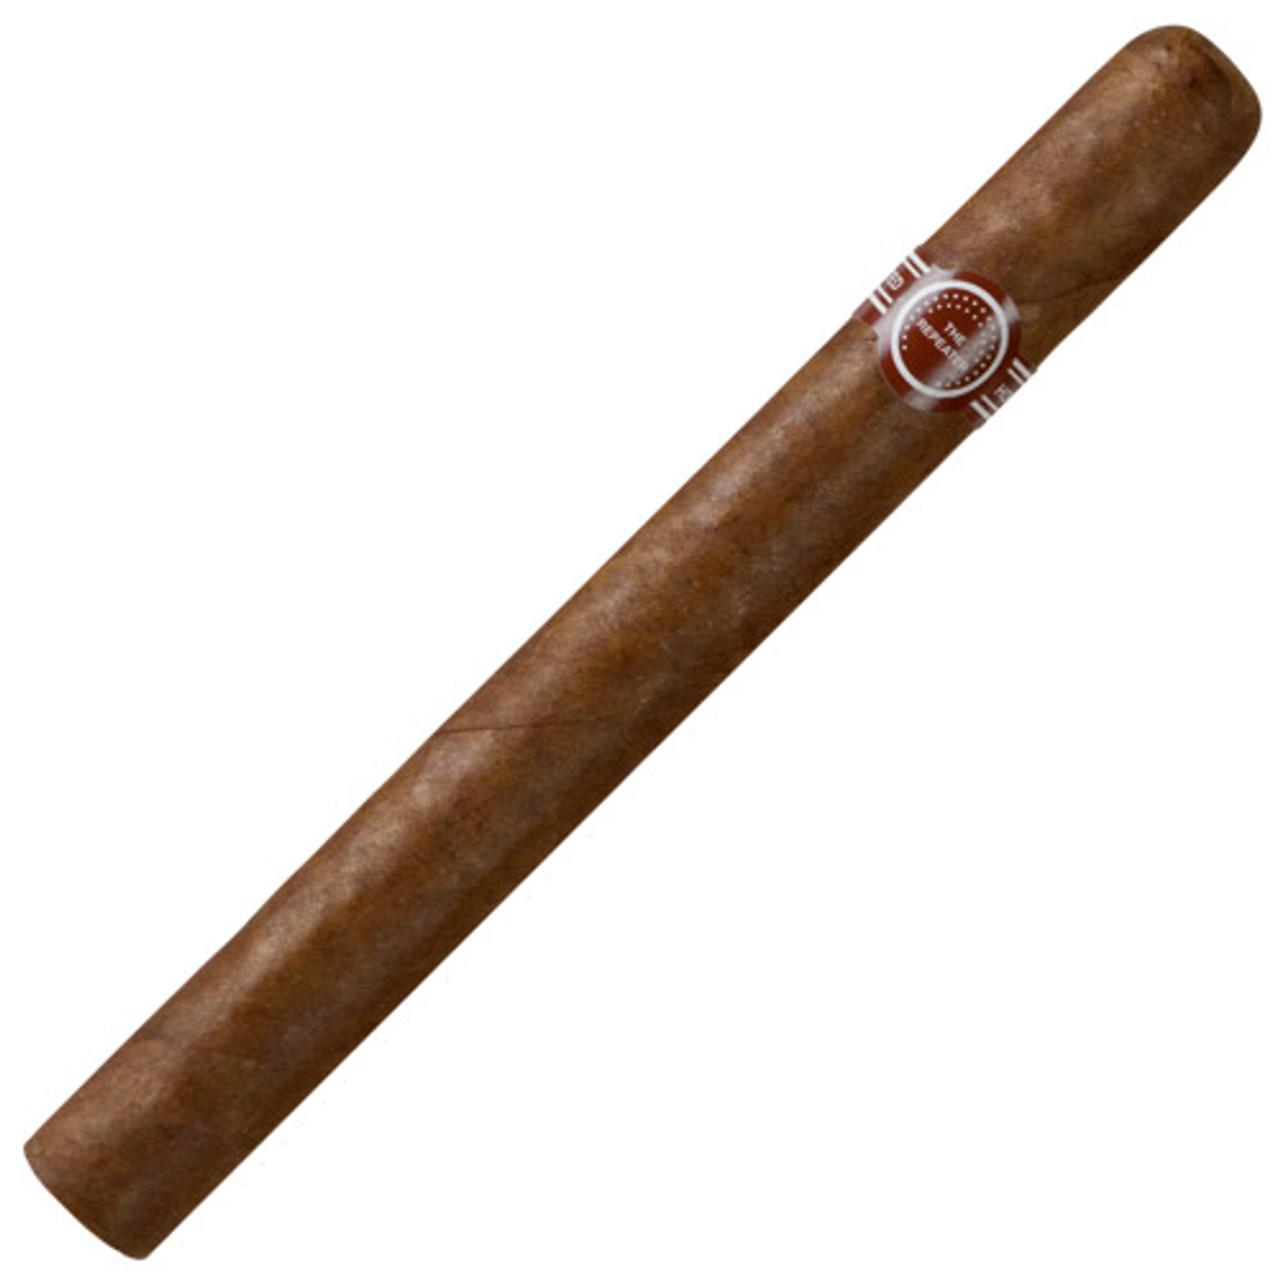 Baccarat Repeater Churchill - 7 x 50 Cigars (Box of 25)